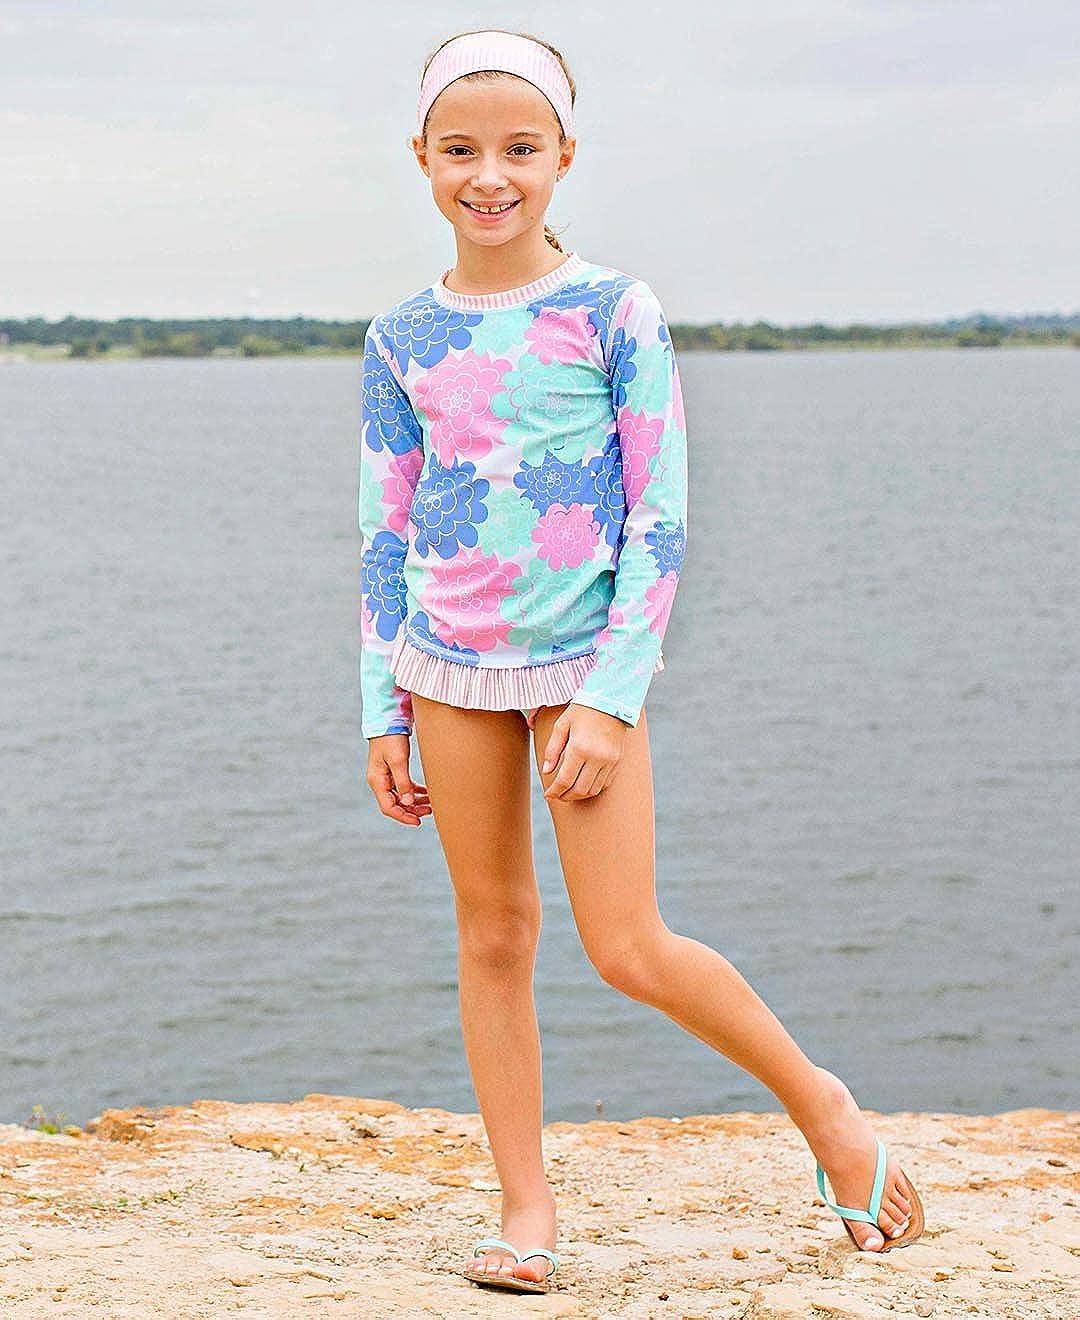 Long Sleeve Bikini with UPF 50 RuffleButts Little Girls Rash Guard 2-Piece Swimsuit Set Sun Protection RGSYYXX-PRLS-SC-TDLR